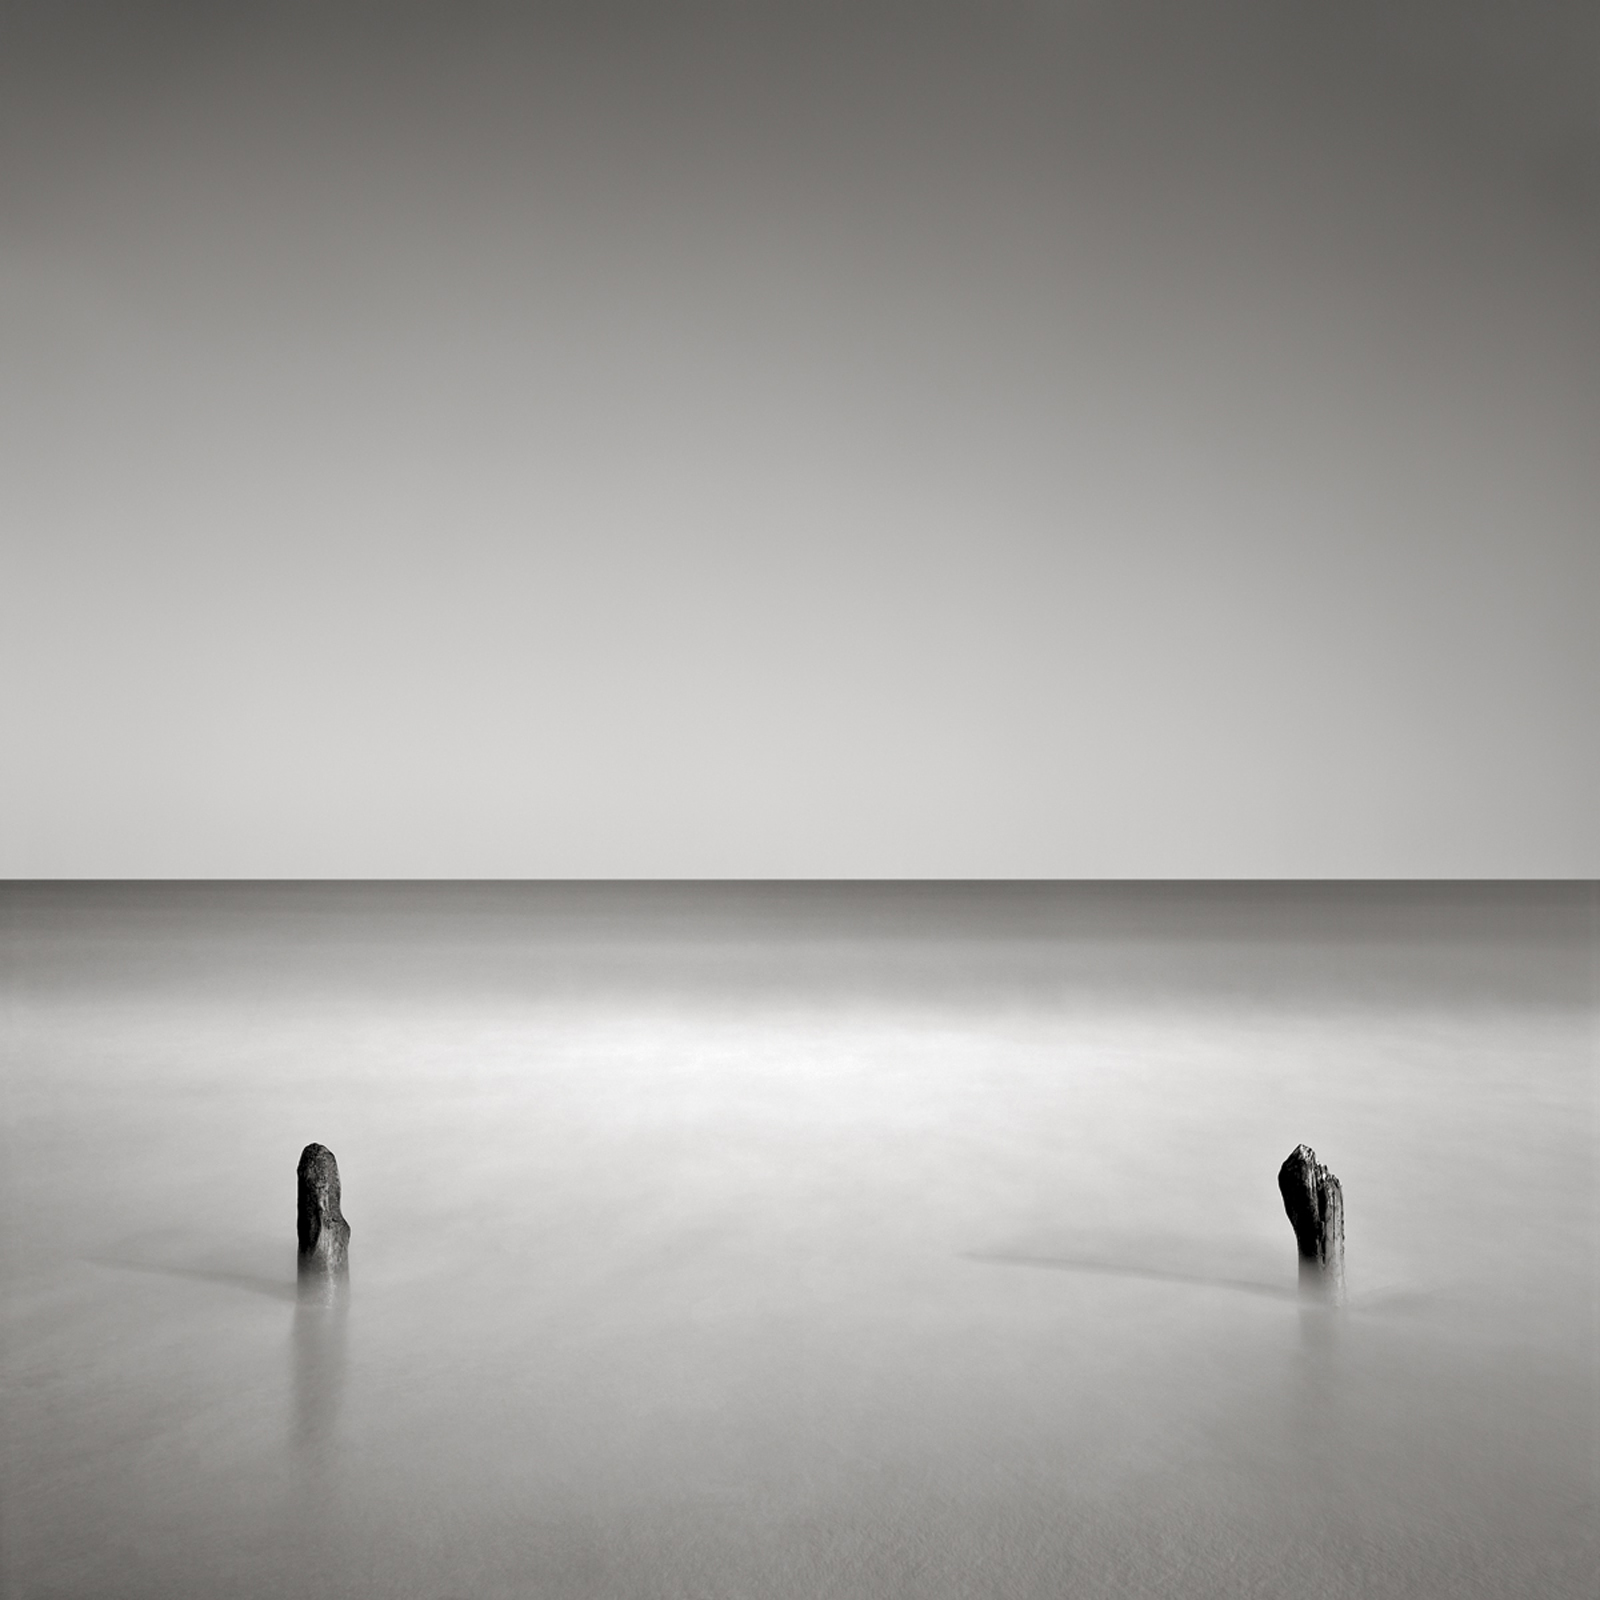 Two Poles, Chilmark, ... by  David Fokos - Masterpiece Online